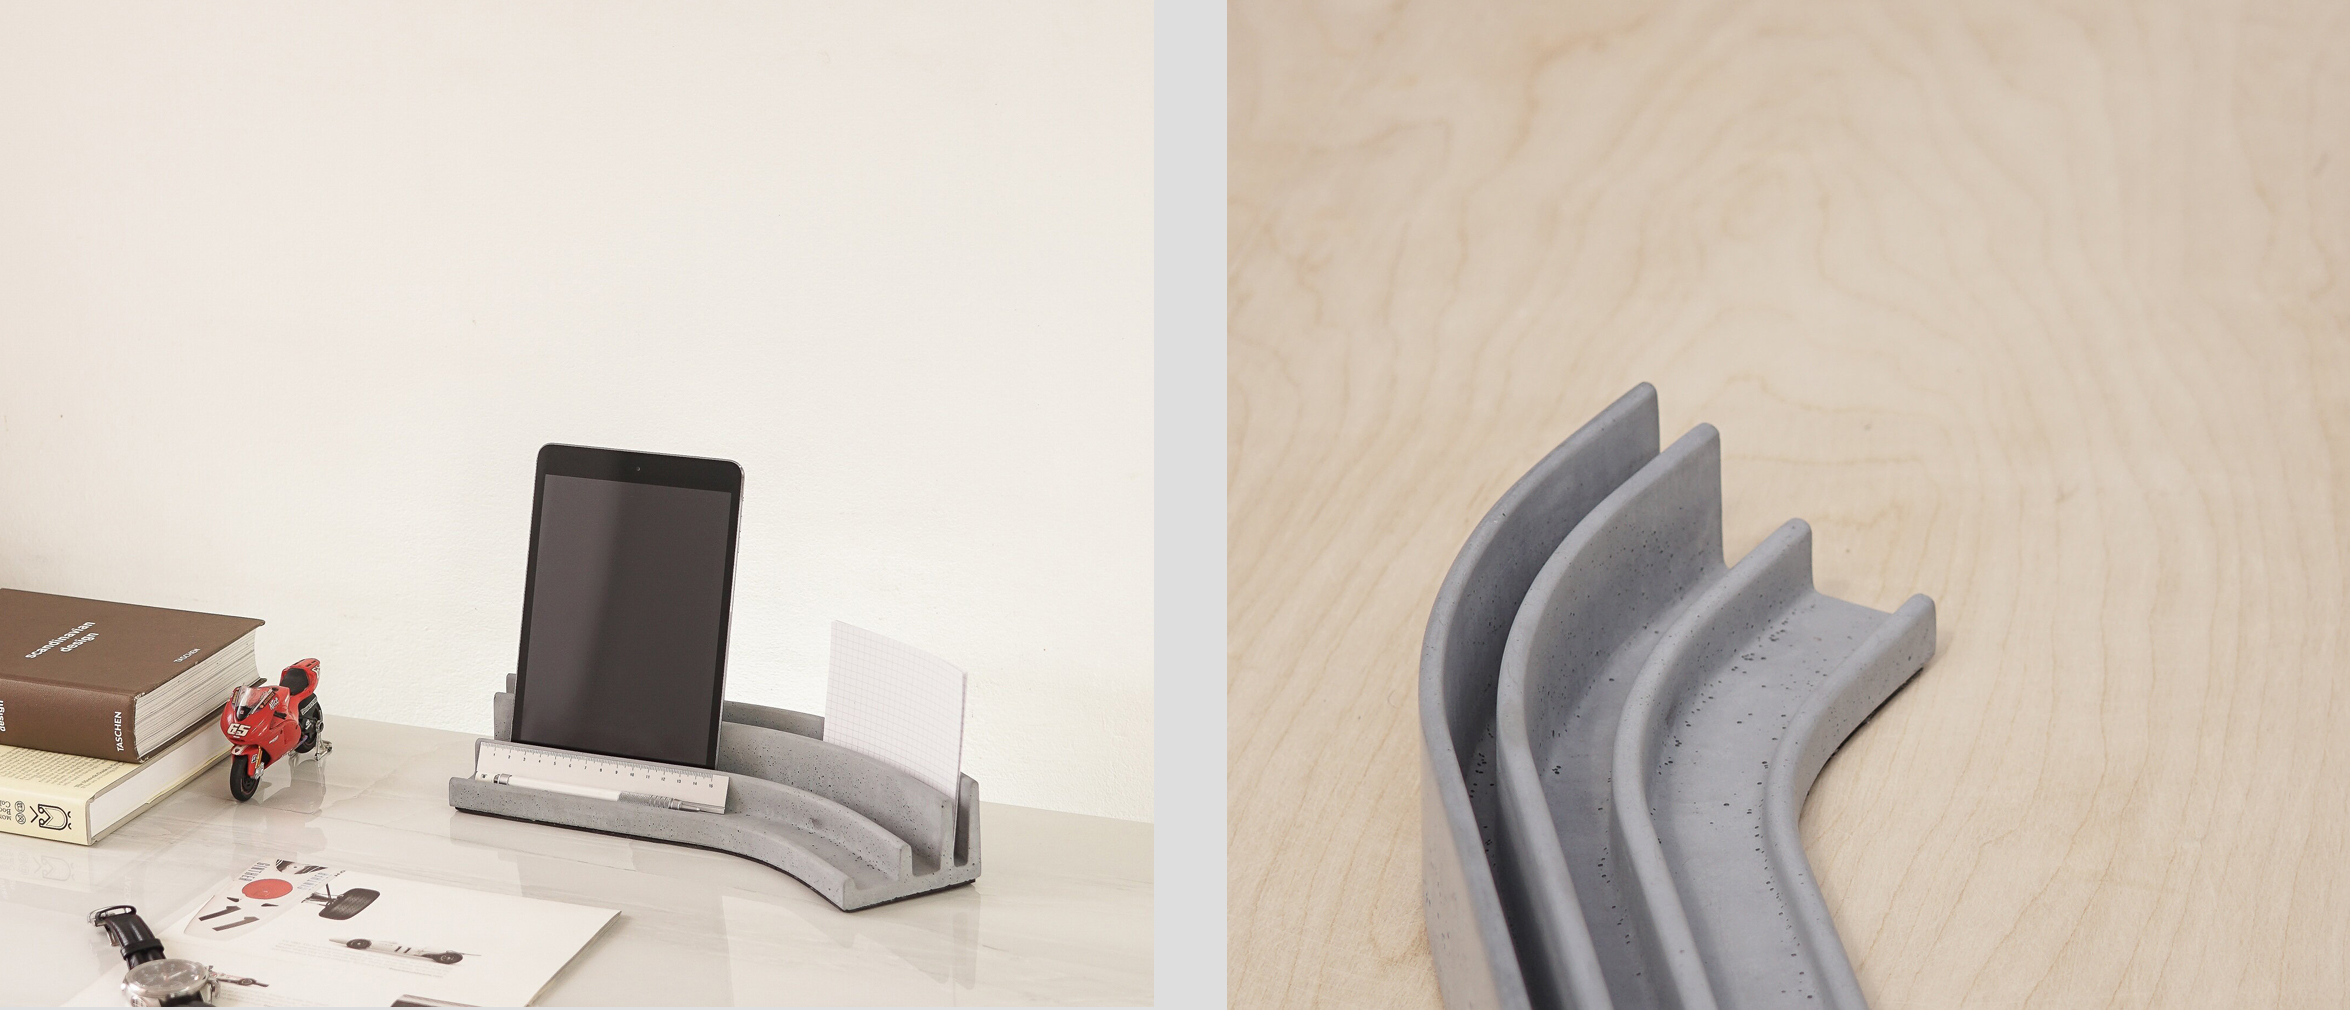 Brutalist desk accessories by Studio Saif Faisal